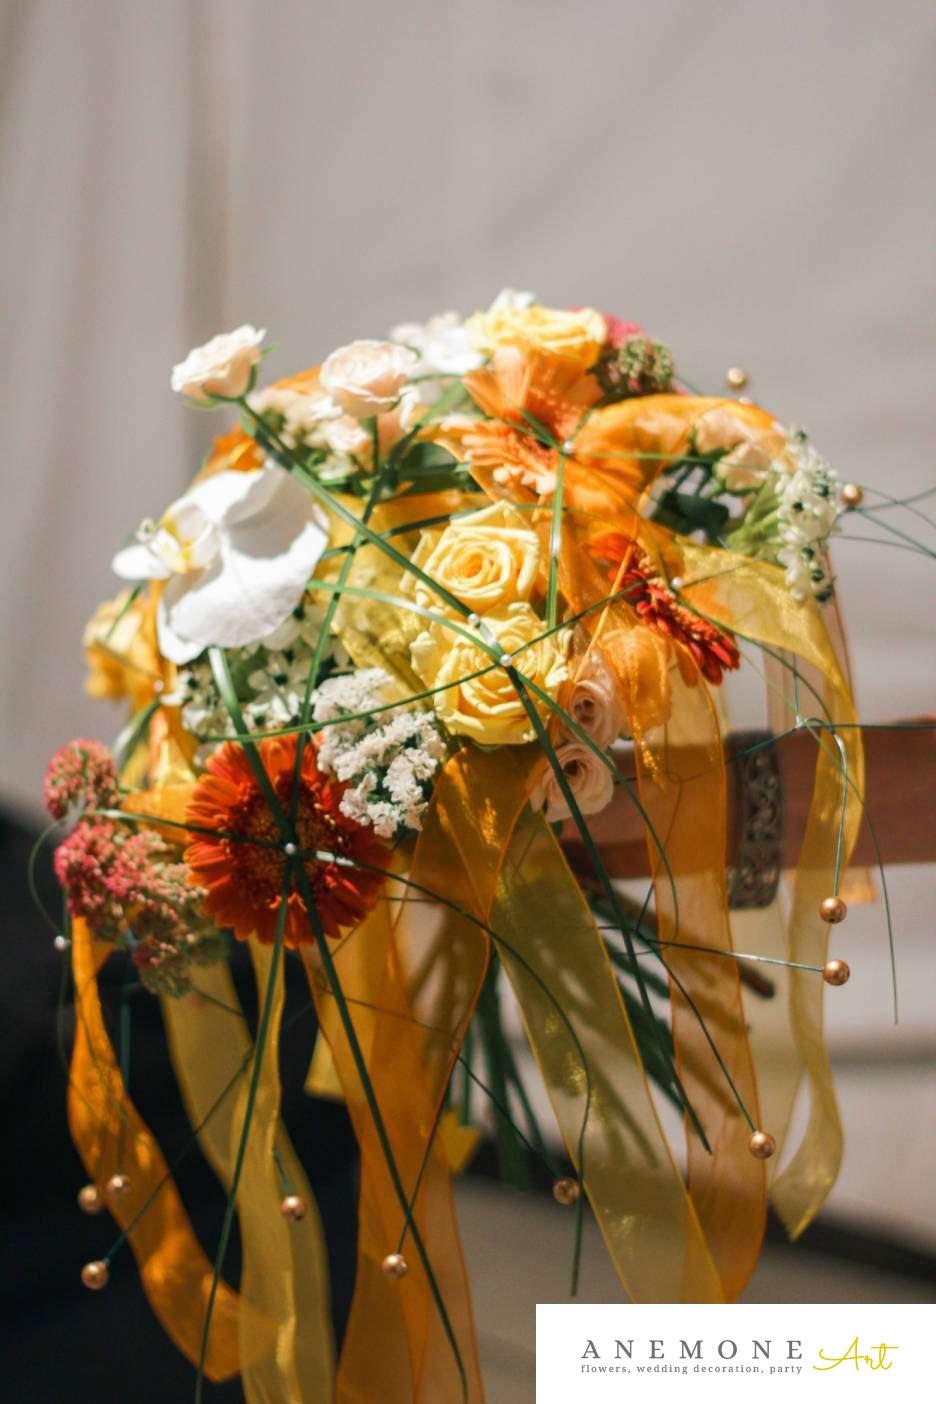 Poza, foto cu Flori de nunta buchet cadou, galben, gerbera, mini-rosa, orhidee, portocaliu, trandafiri in Arad, Timisoara, Oradea (wedding flowers, bouquets) nunta Arad, Timisoara, Oradea